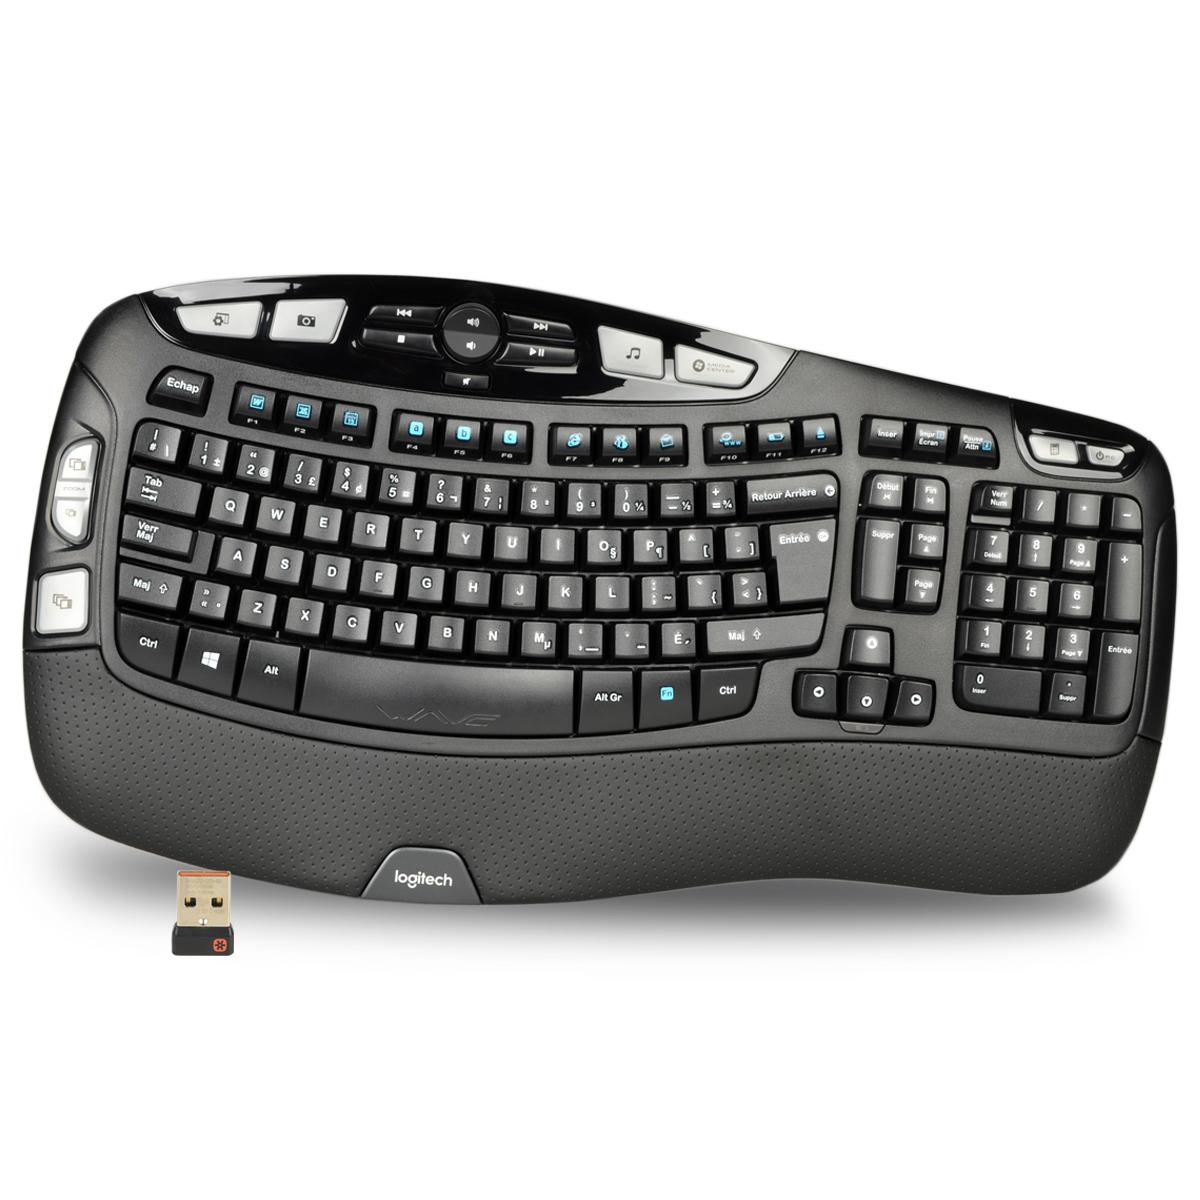 Logitech K350 102 Key Wireless USB Multimedia Wave Keyboard - French Layout $27.95 + FS